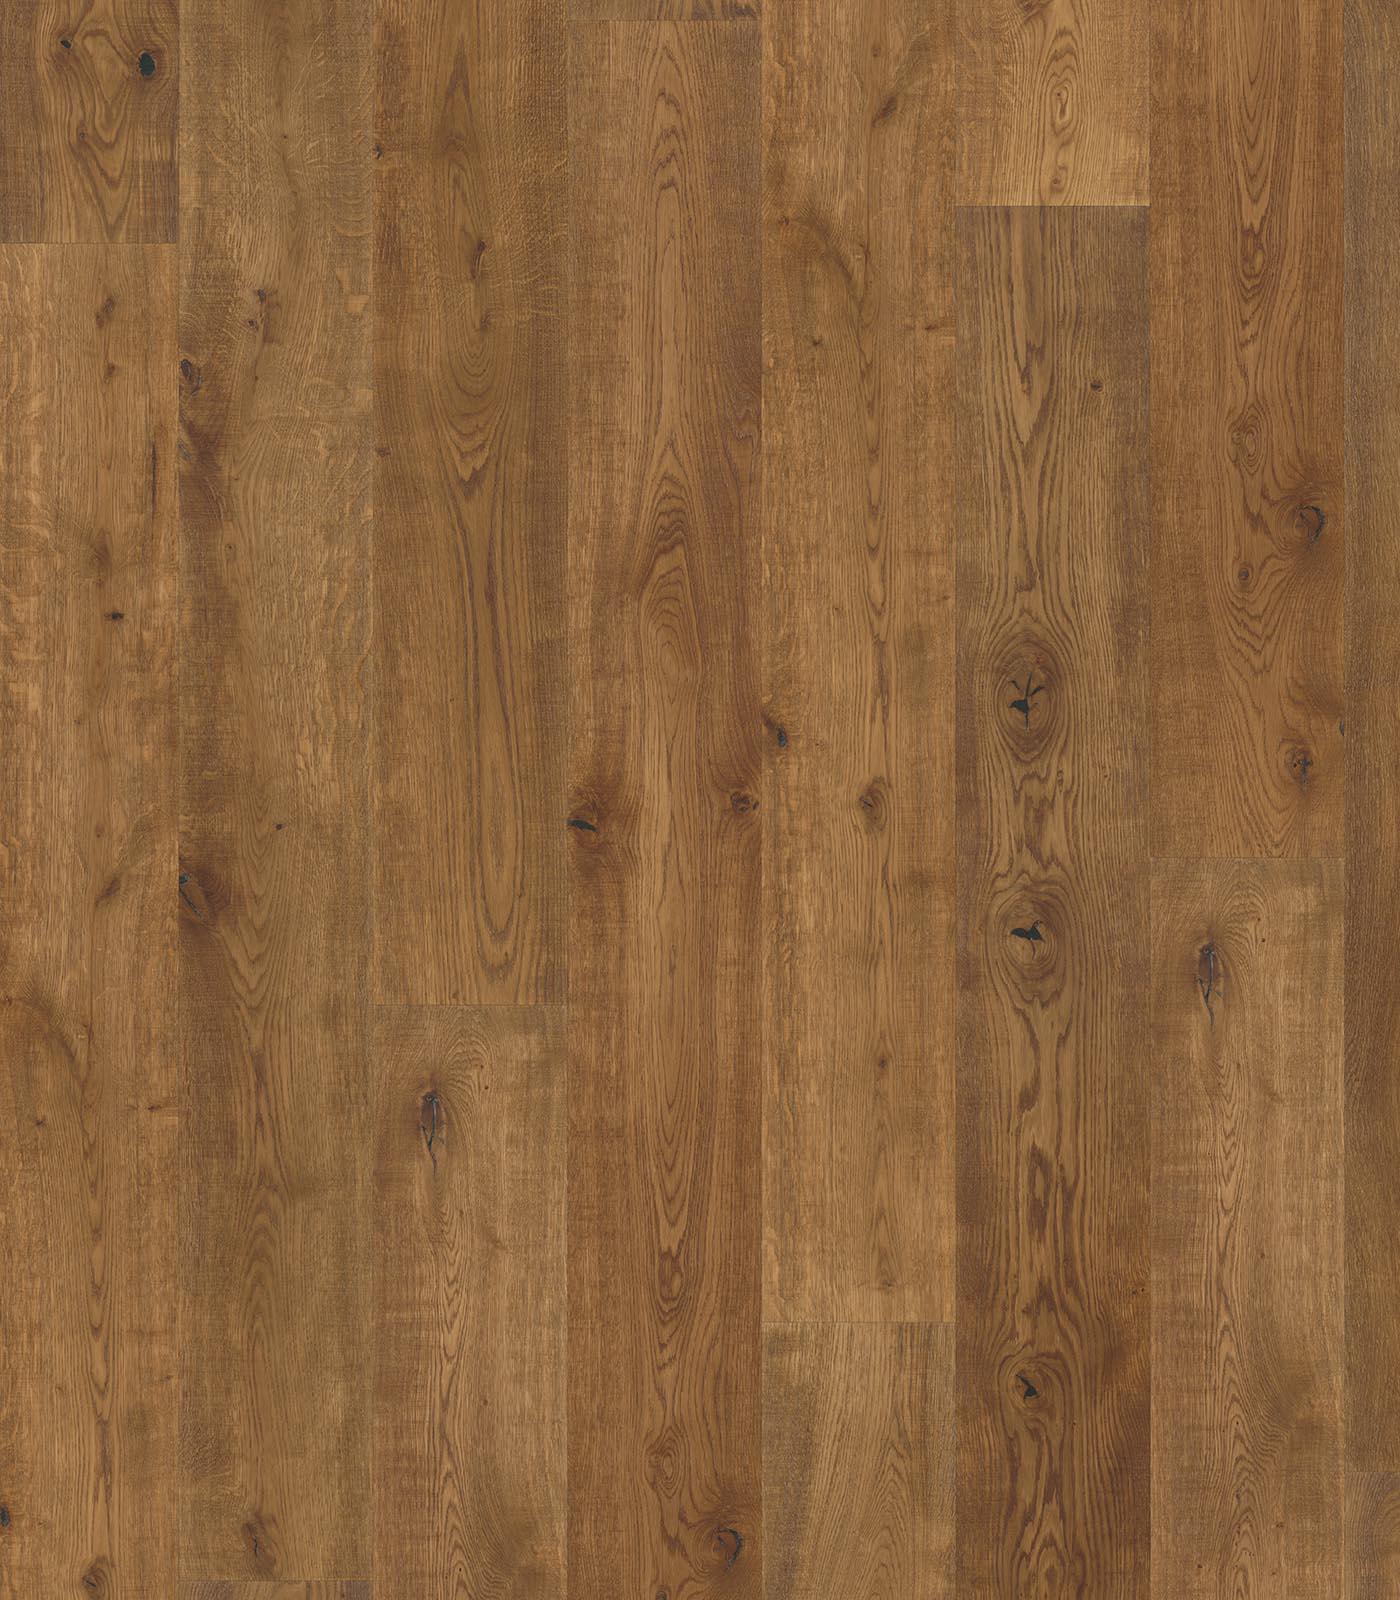 Mount Cook-Antique Collection-European Oak floors-flat